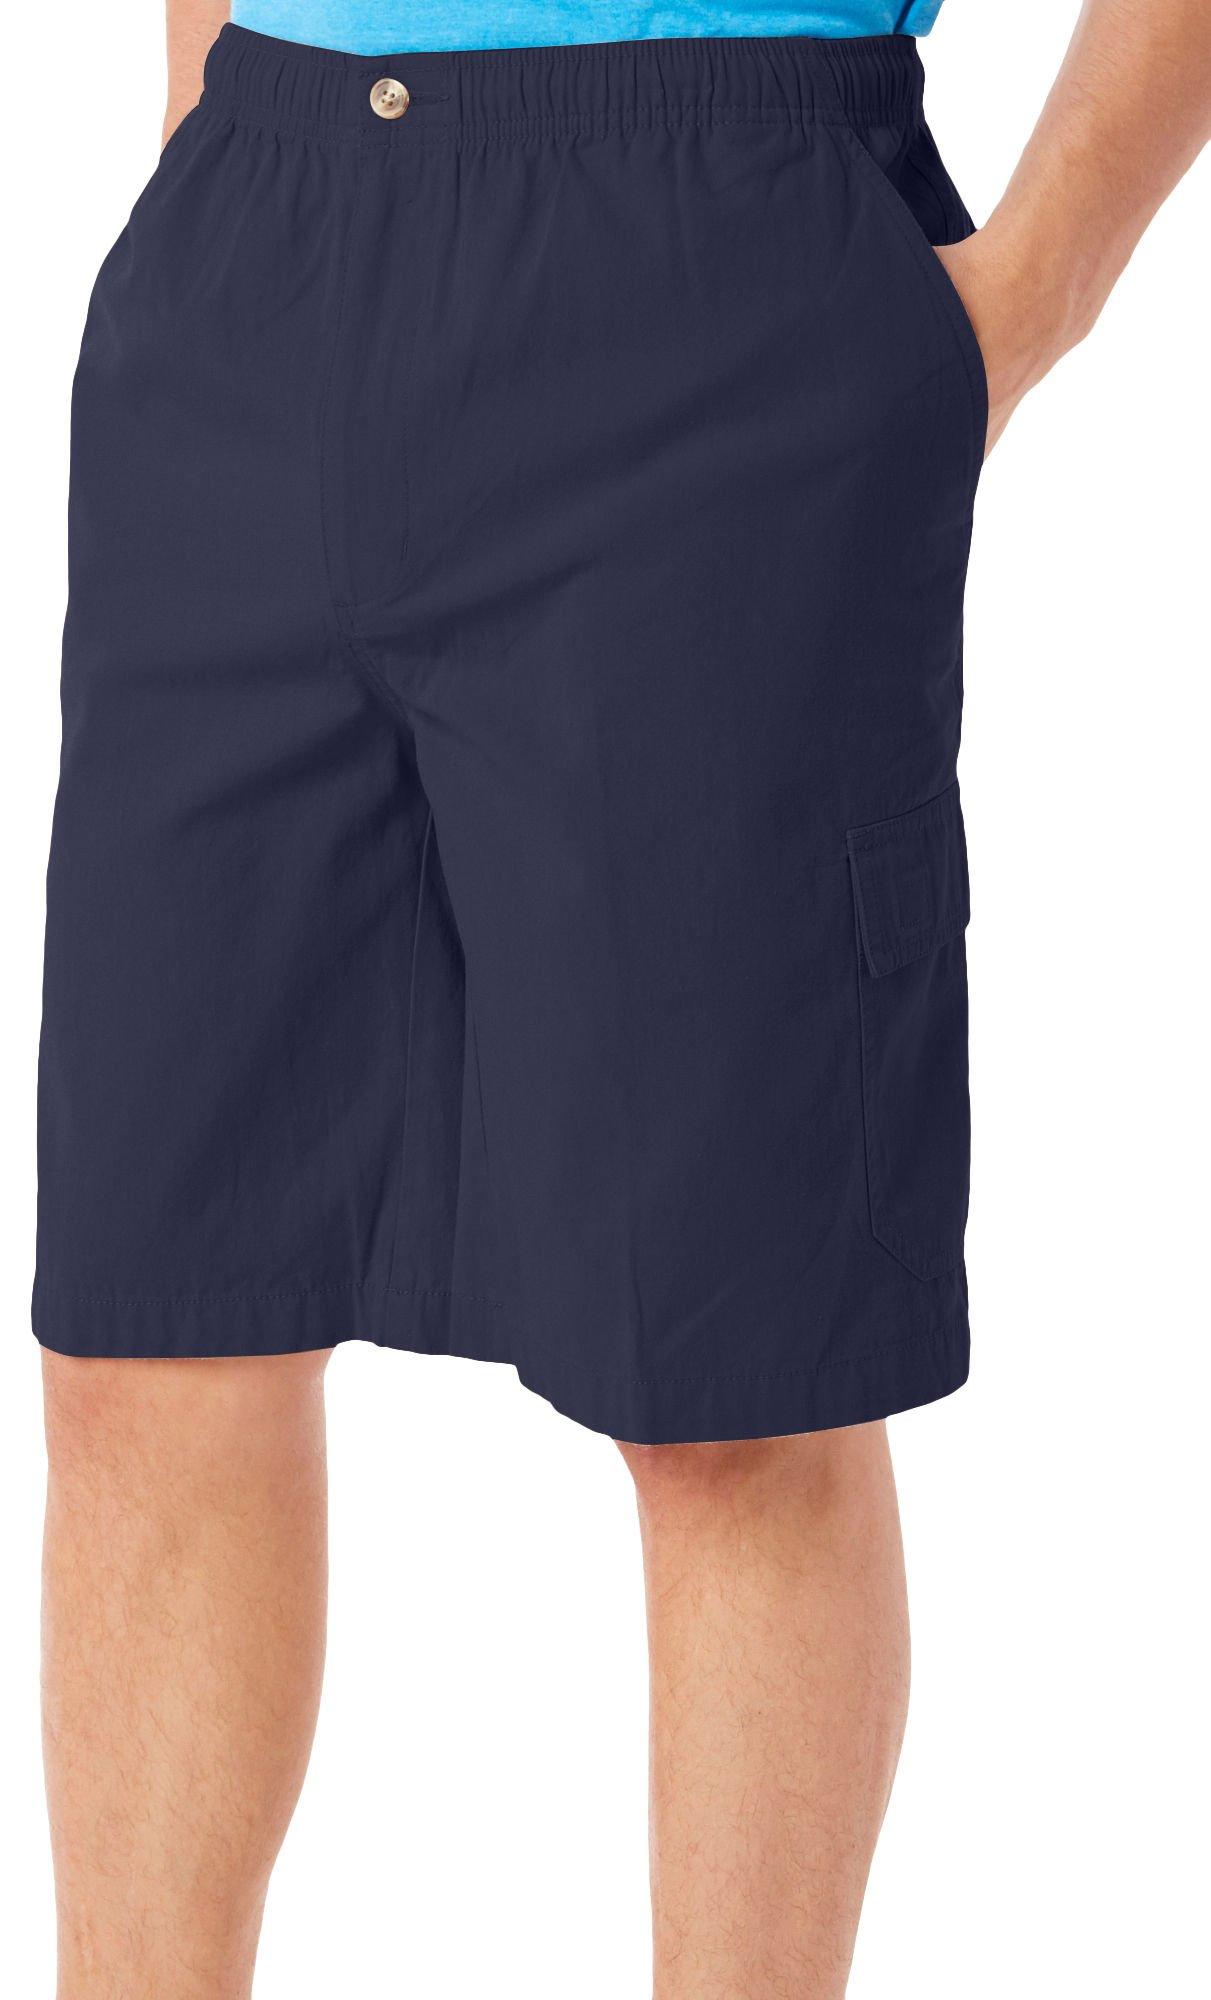 Windham Pointe Mens Elastic Waist Cargo Shorts X-Large Peacoat Navy Blue